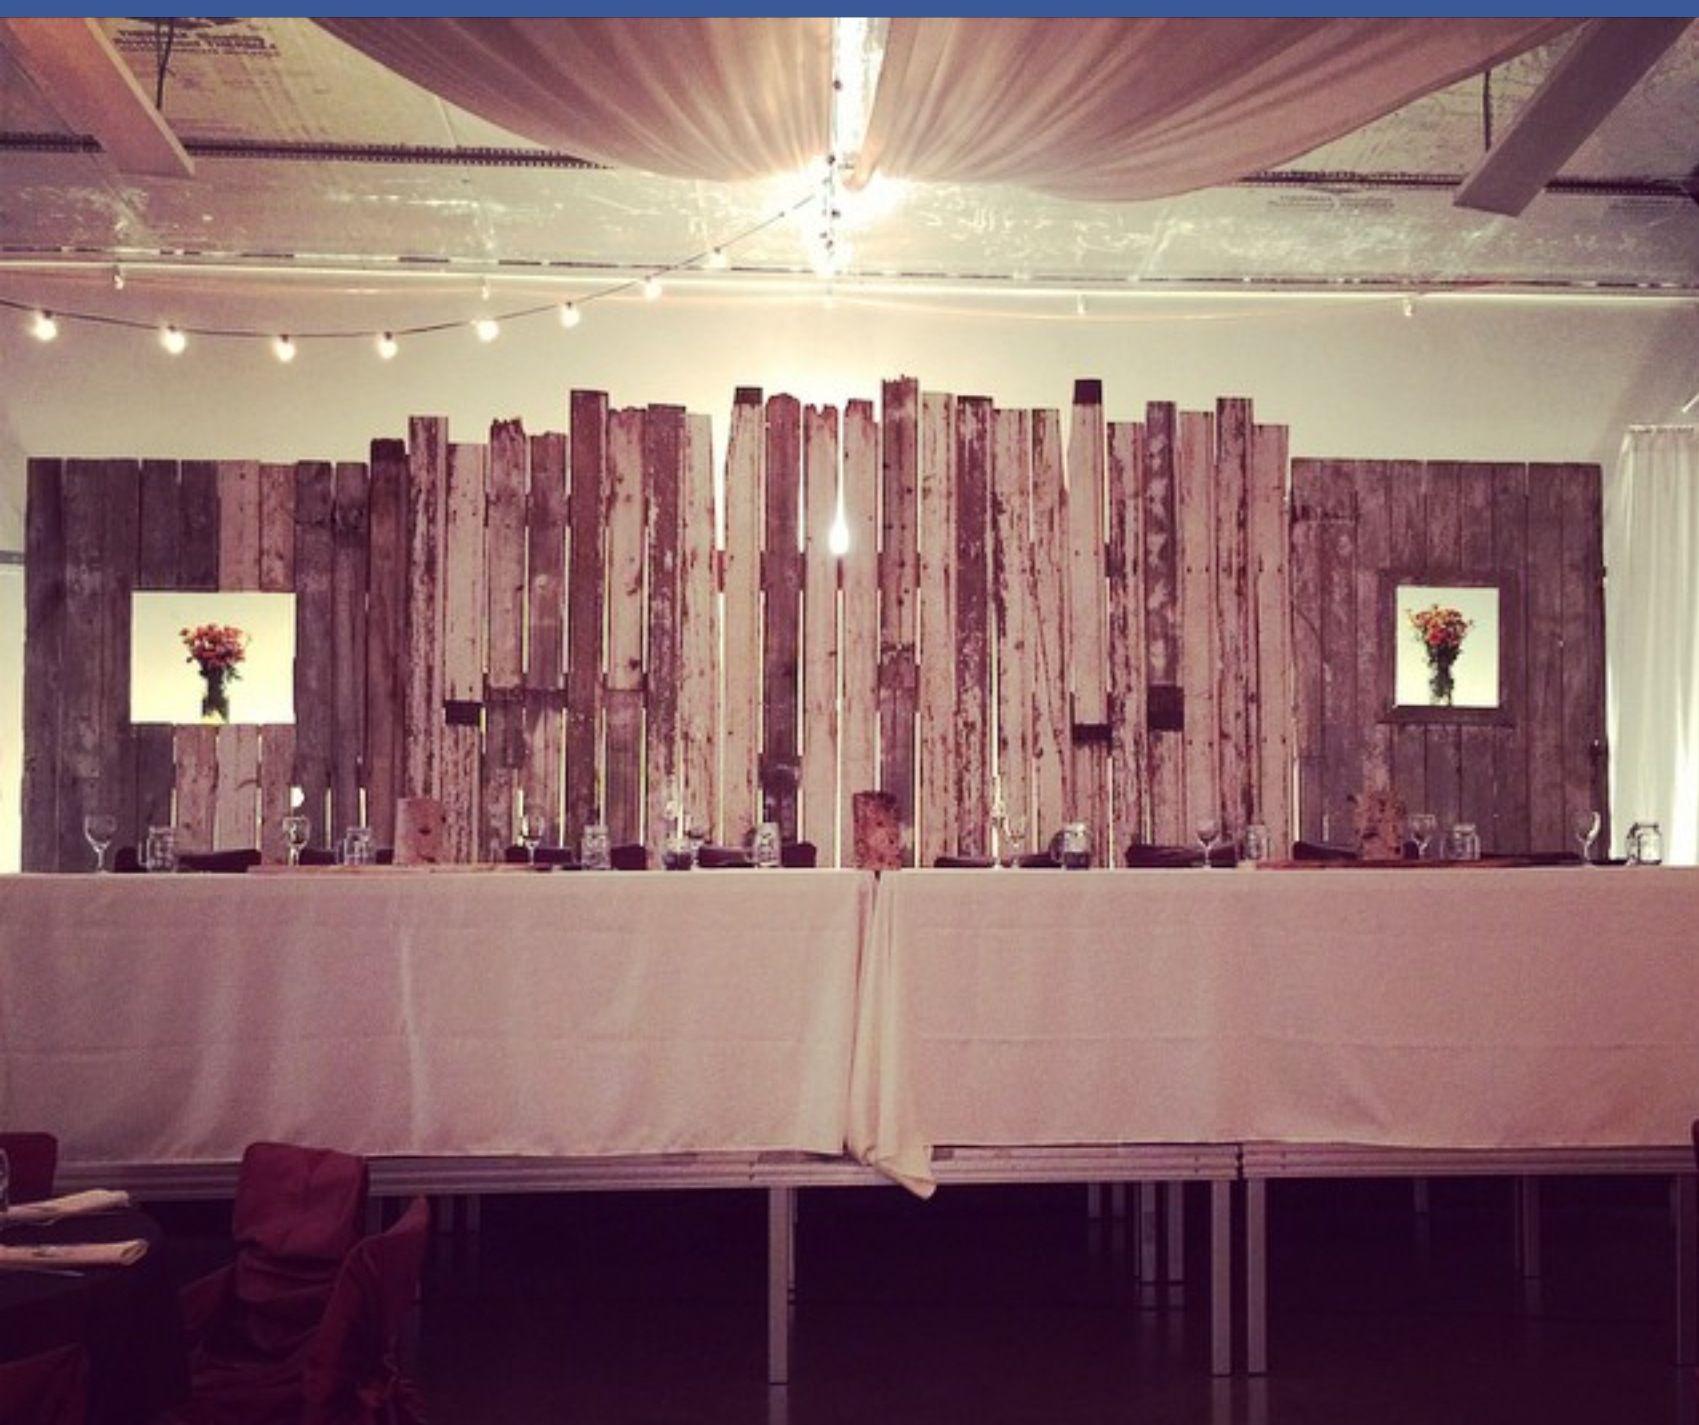 Wedding Reception Head Table Ideas: Rustic Barn Wood Backdrop For Head Table At Wedding